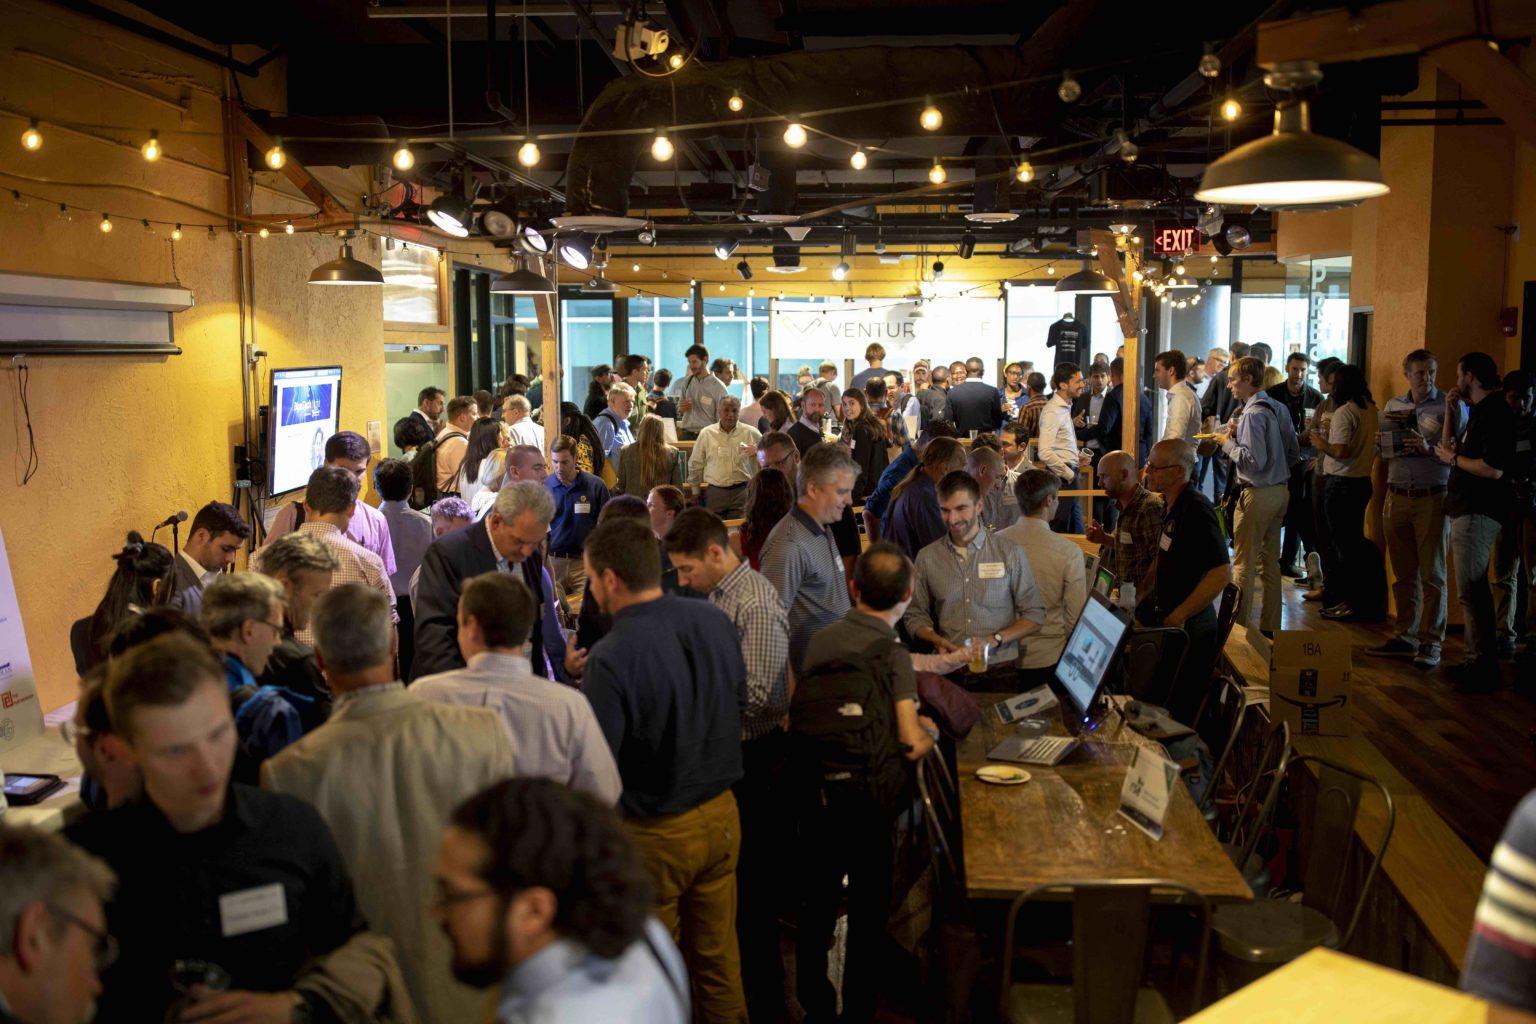 Crowded Venture Café space